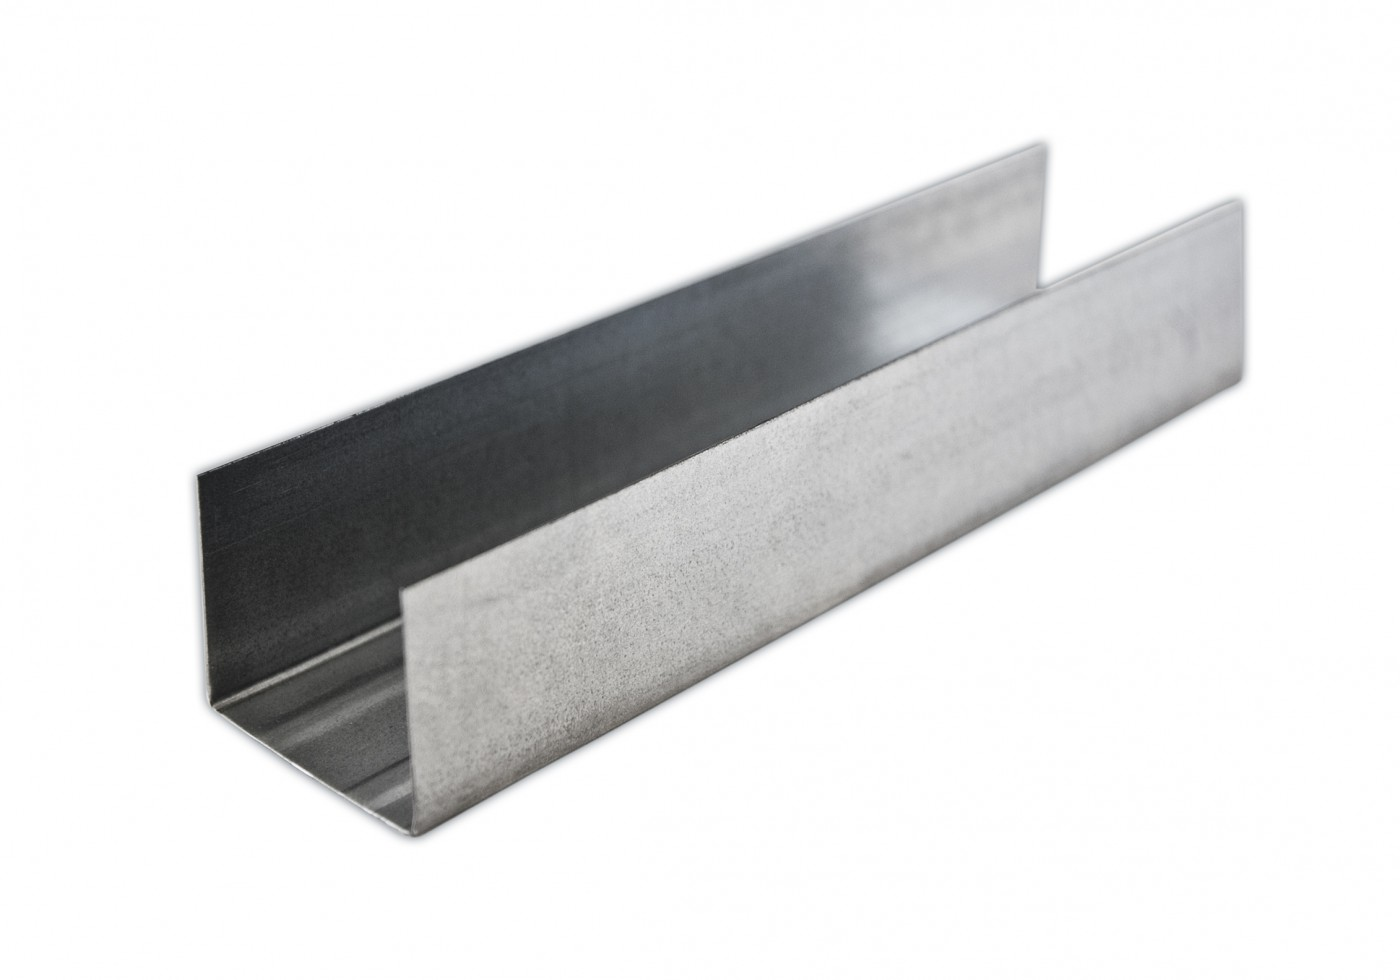 Профиль направляющий 75х40 стандарт-2 0,4мм